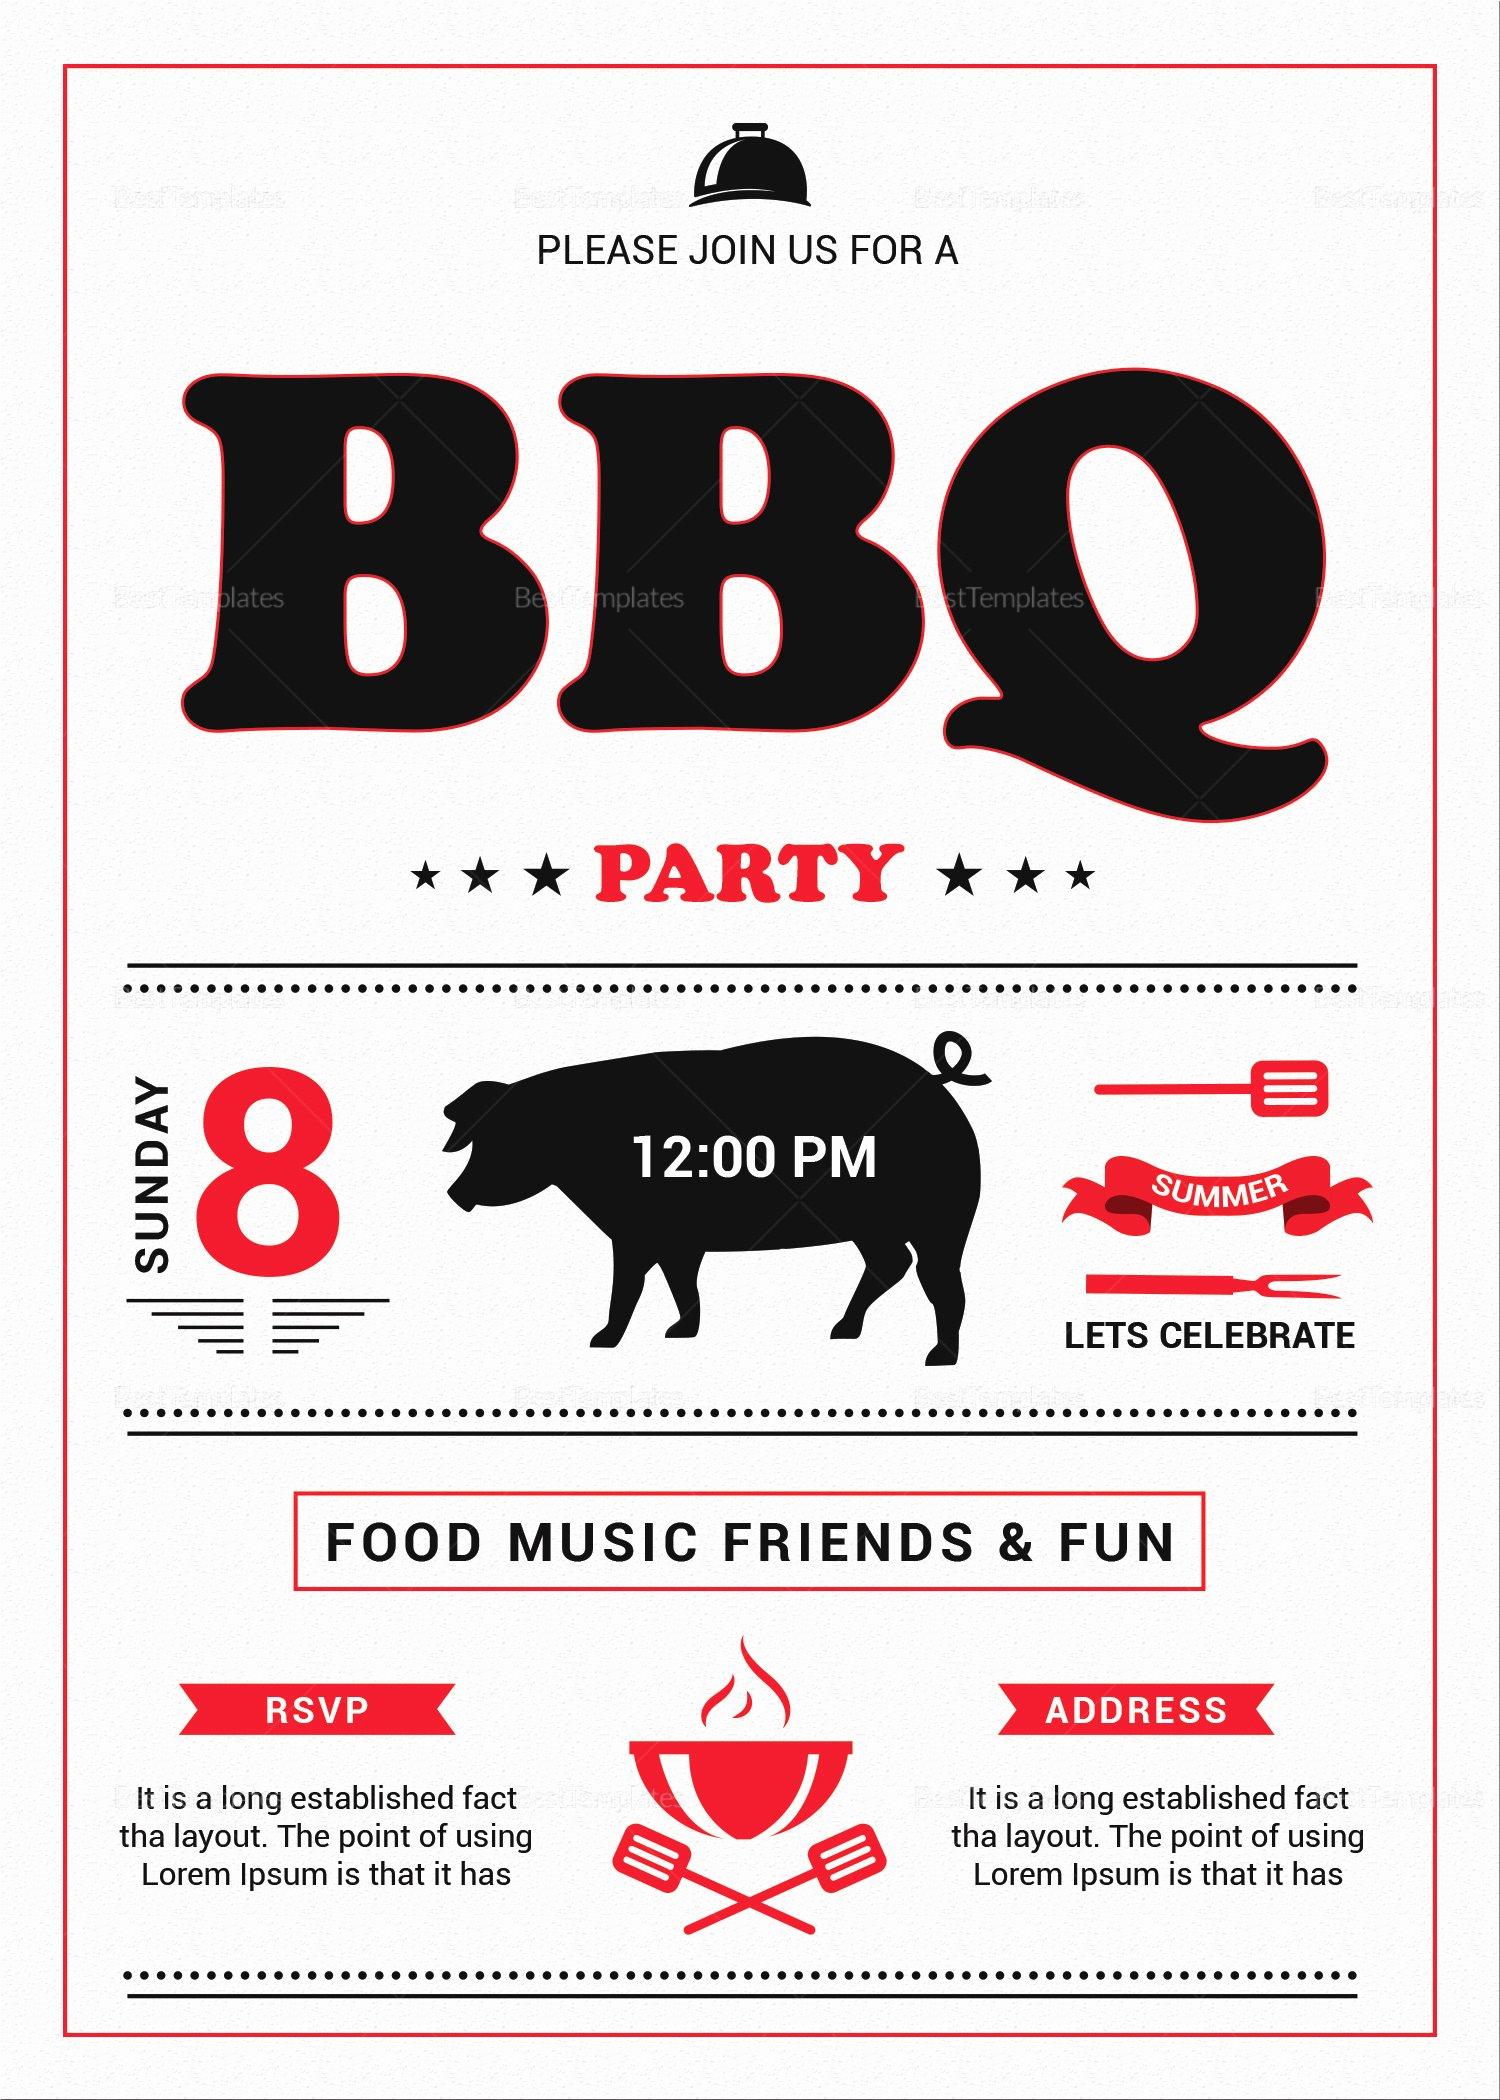 Bbq Invitation Template Word Fresh Tasty Barbecue Lunch Invitation Design Template In Psd